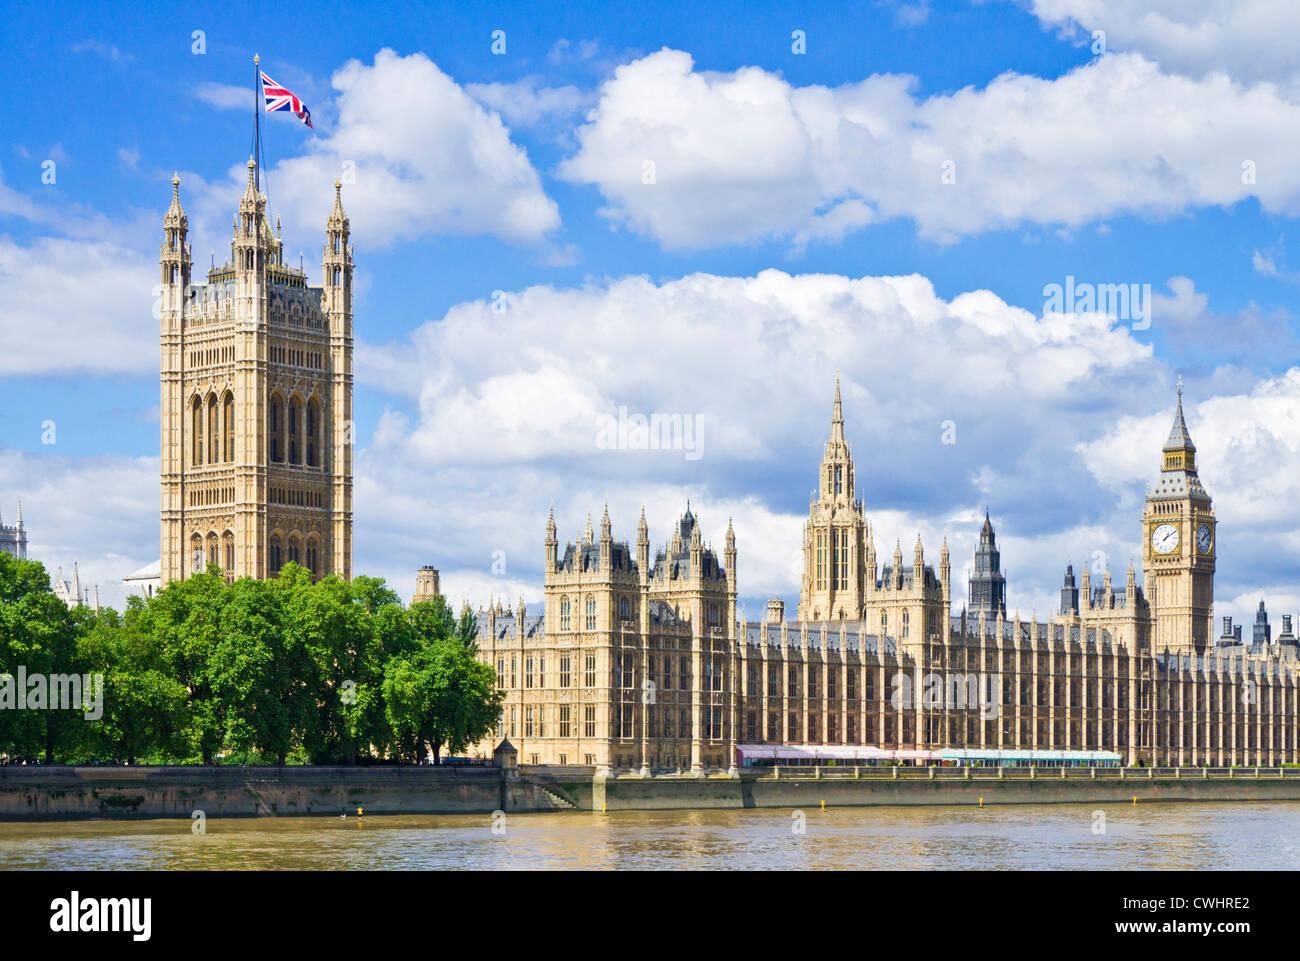 London Skyline London Houses of Parliament London Big Ben London City of london City London Stadtbild Union Flag Stockfoto